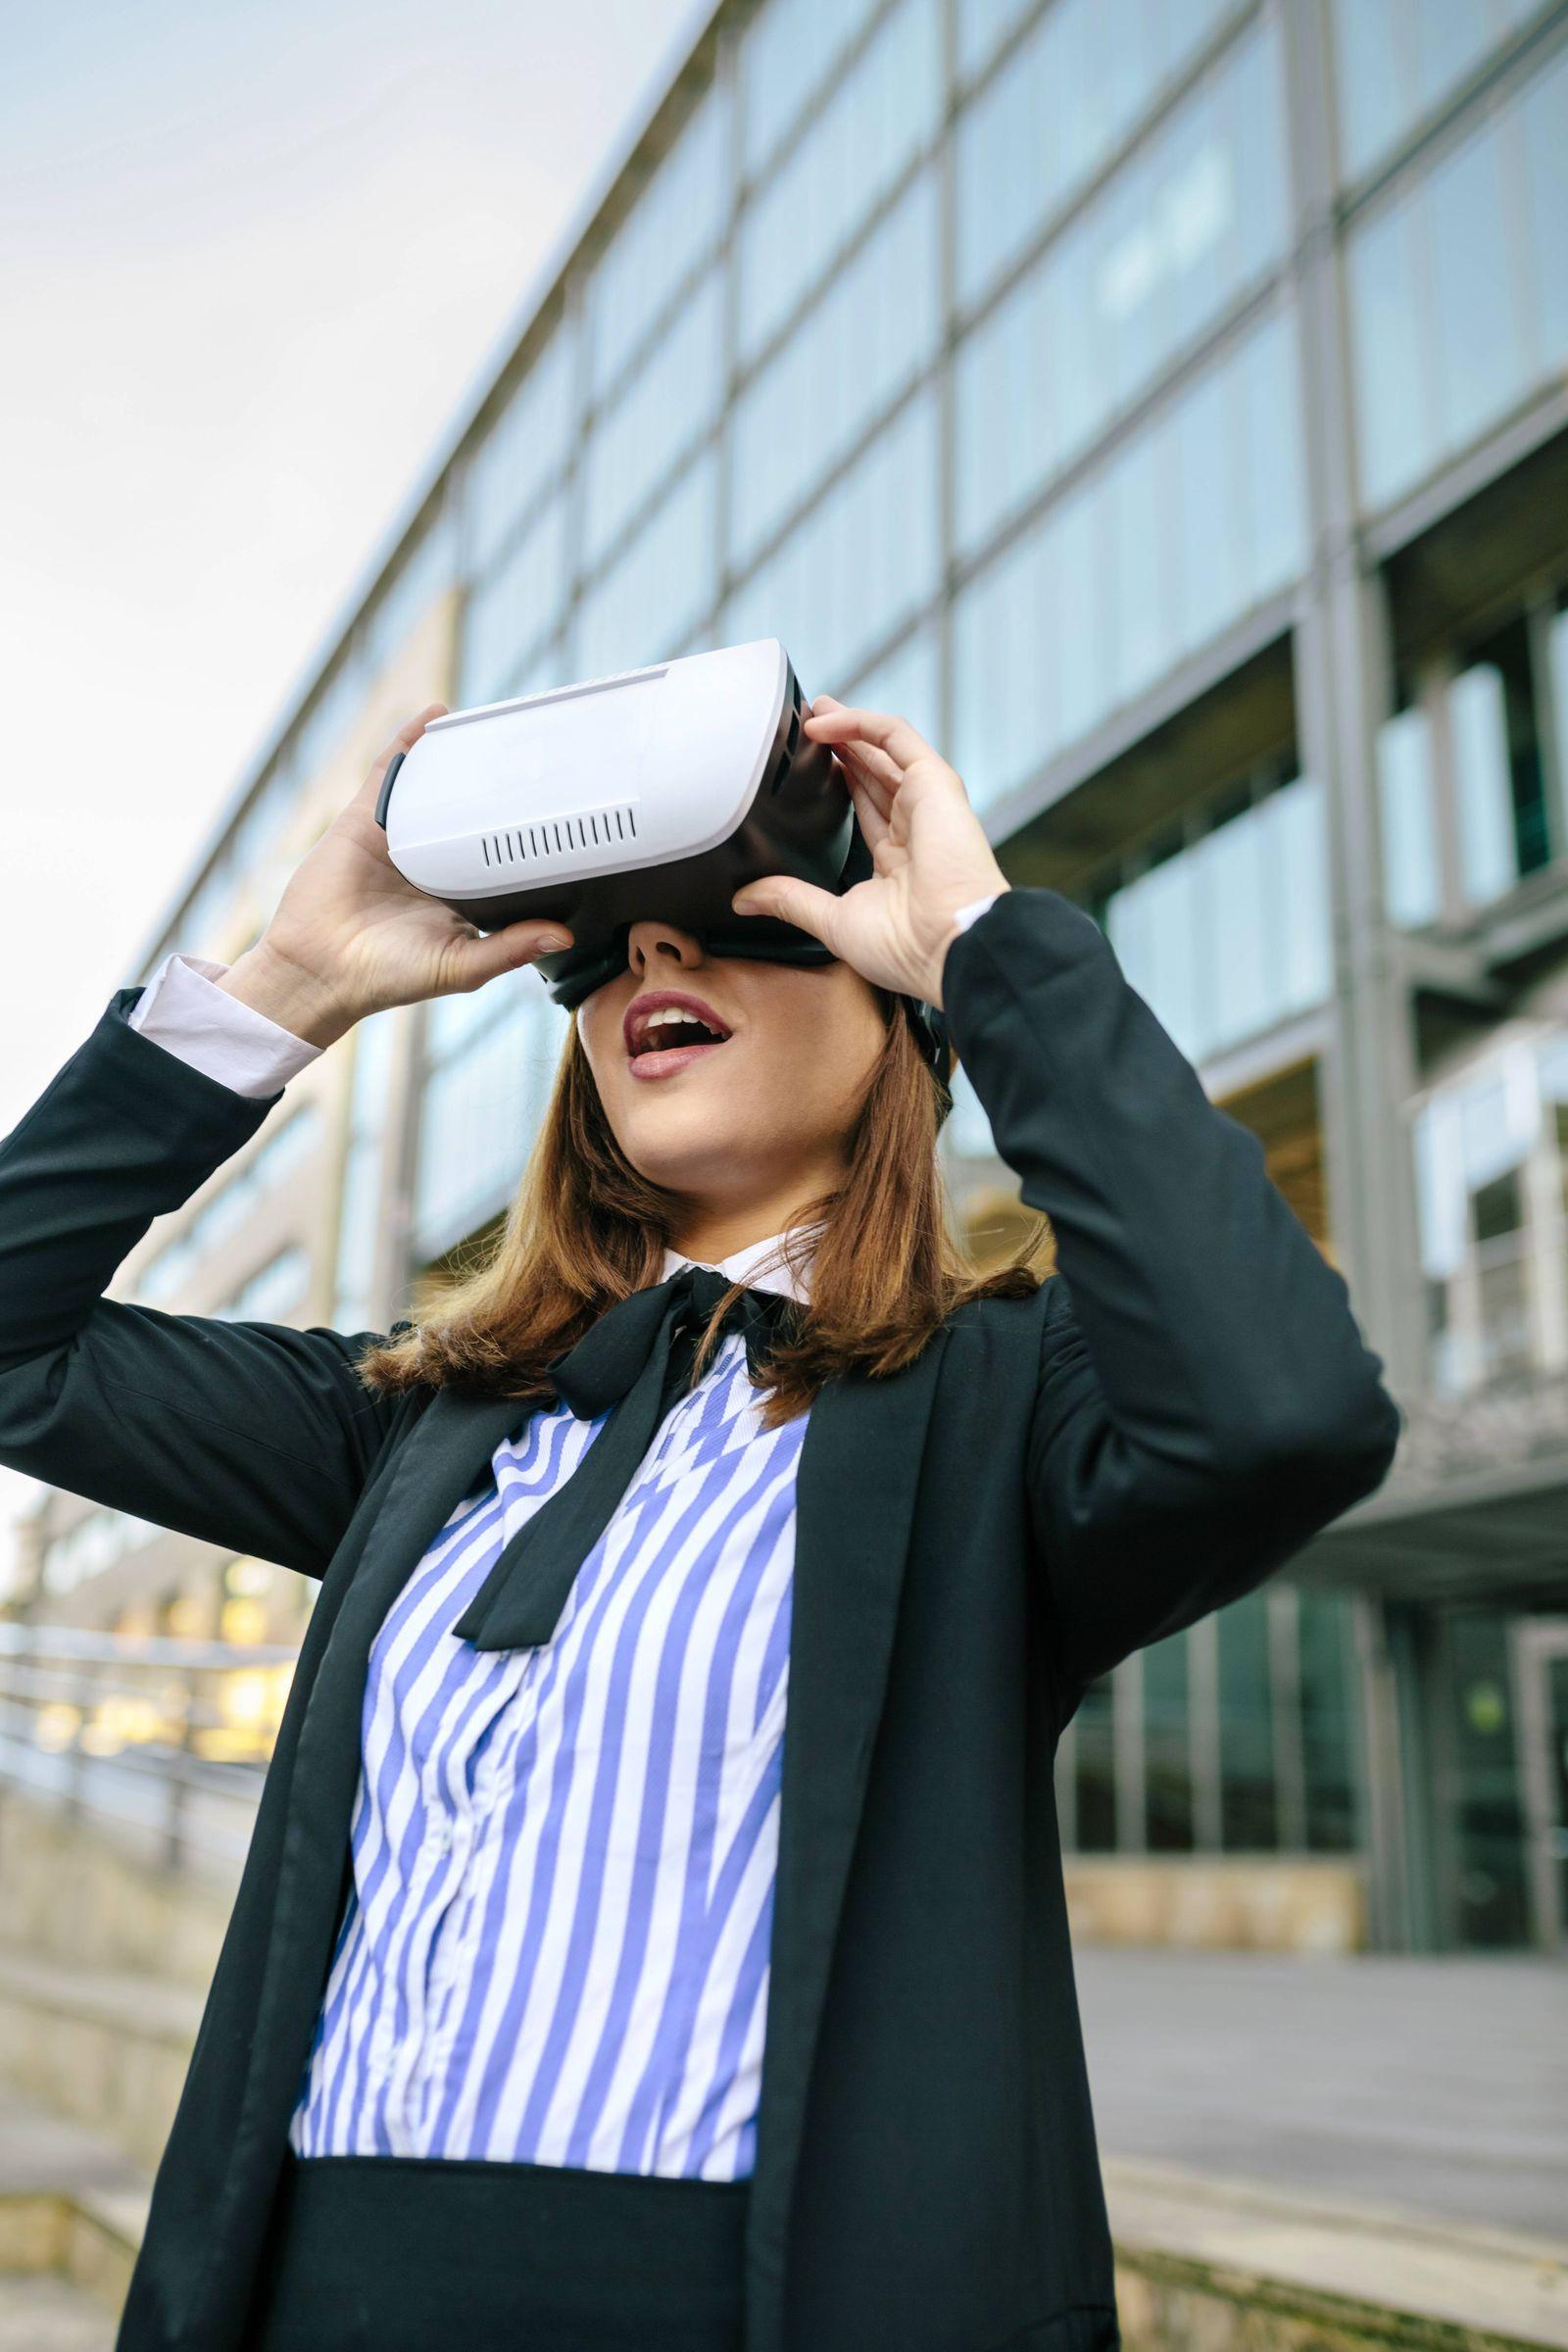 EINMALIGE VERWENDUNG VR Brille / Businessfrau / Virtuel Reality